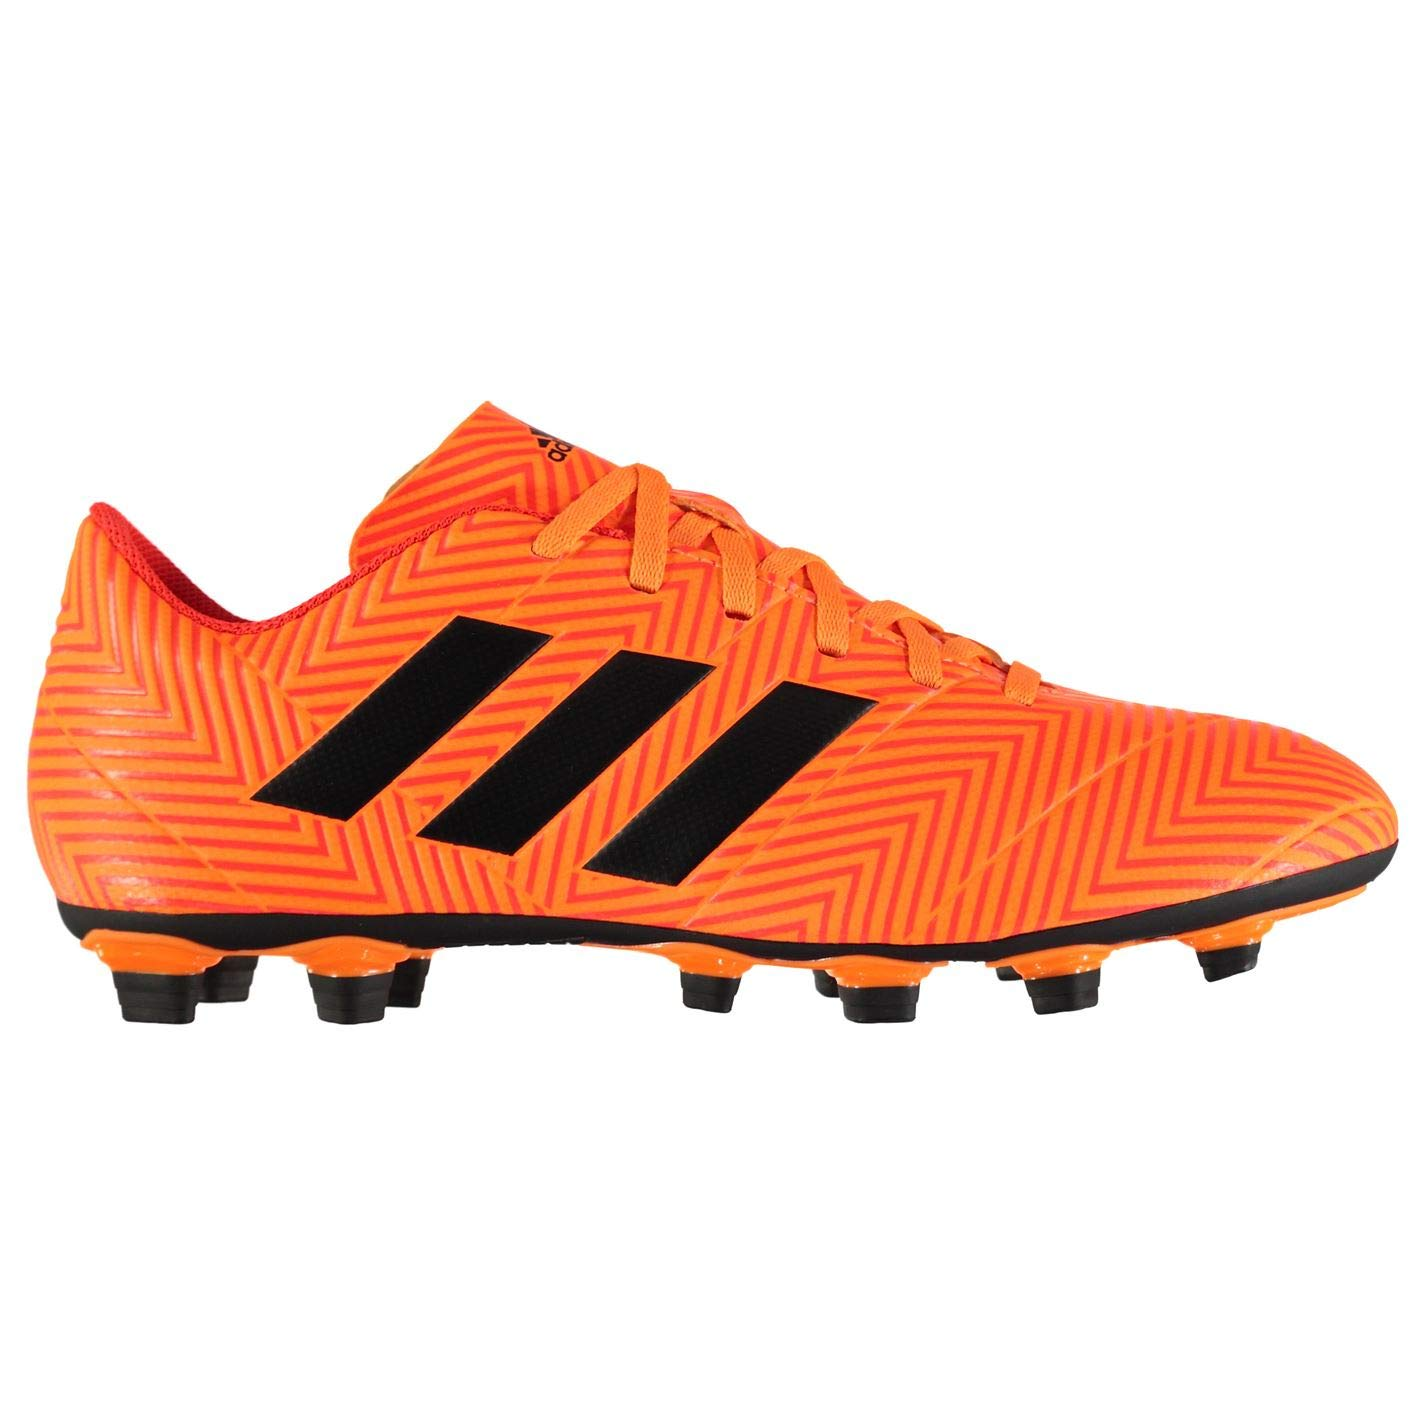 Adidas Unisex-Erwachsene Nemeziz 18.4 Fxg Fußballschuhe